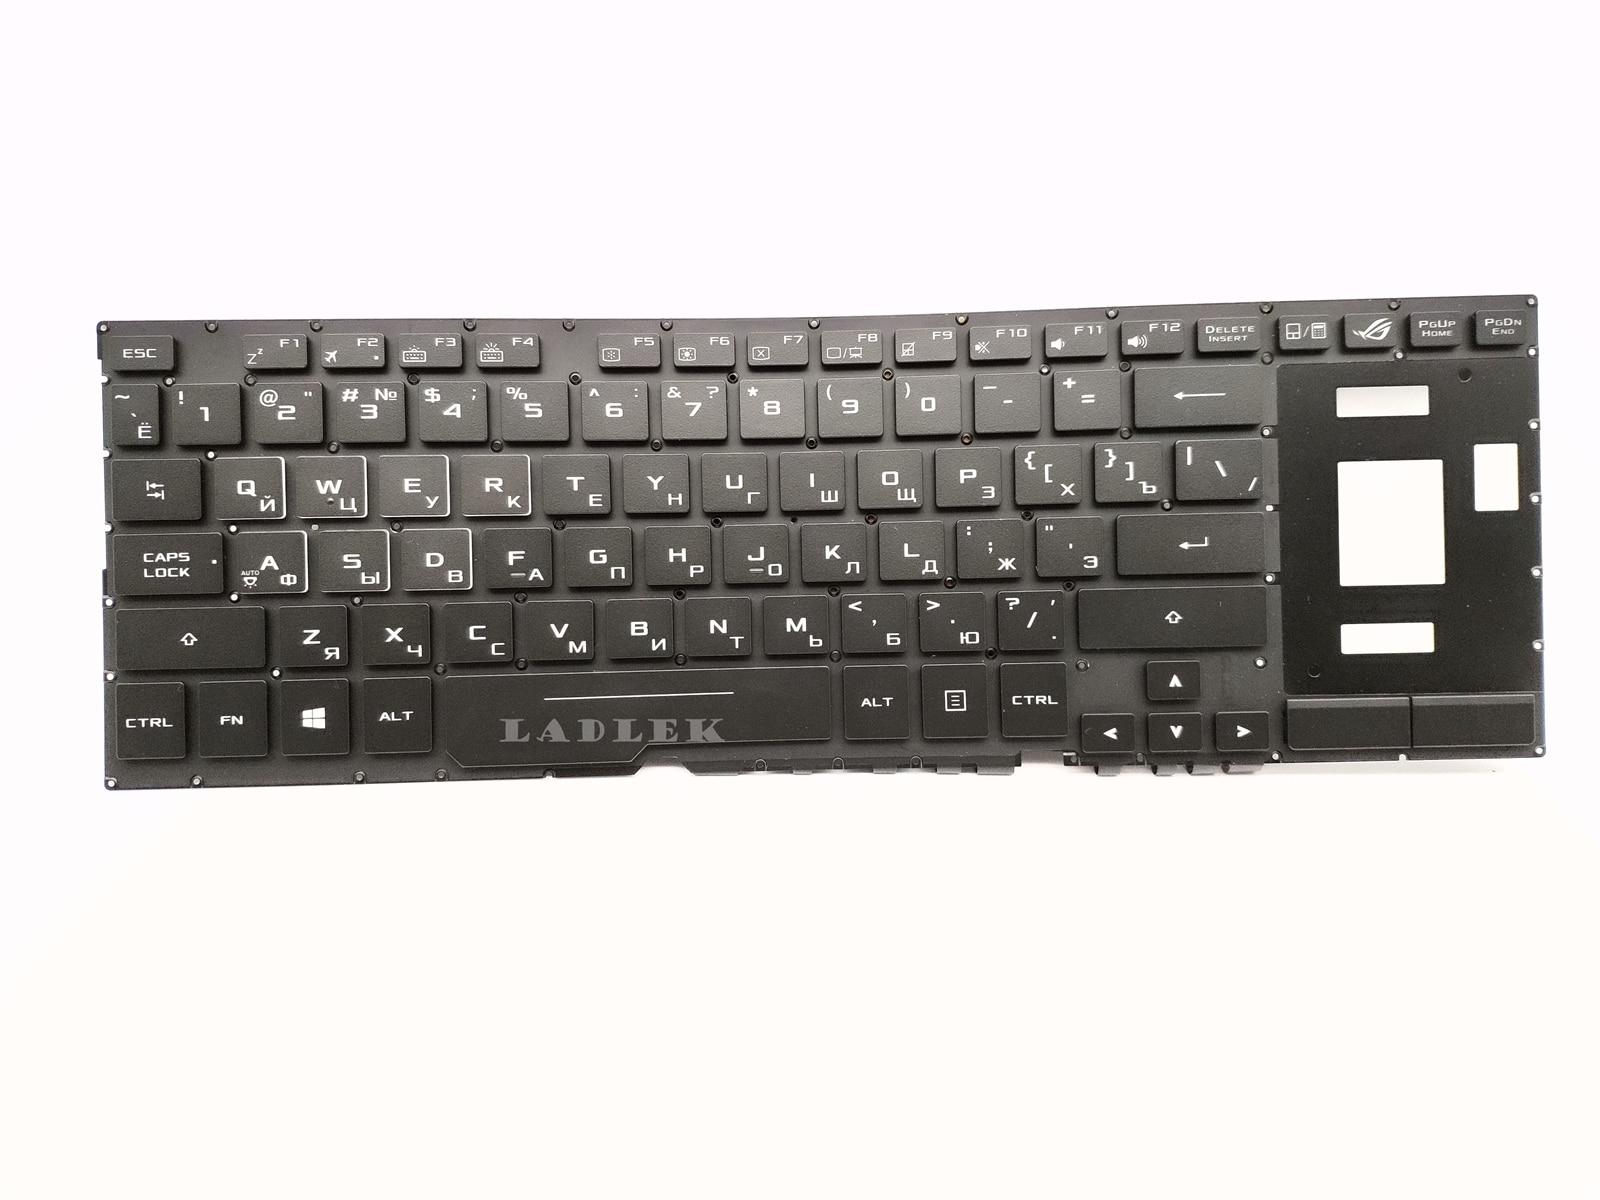 New Russian Backlit Keyboard for Asus GX501 GX501VI GX501VIK GX501VS GX501VSK V161162BS1 0KN1 161RU21 0KNB0 6617RU00